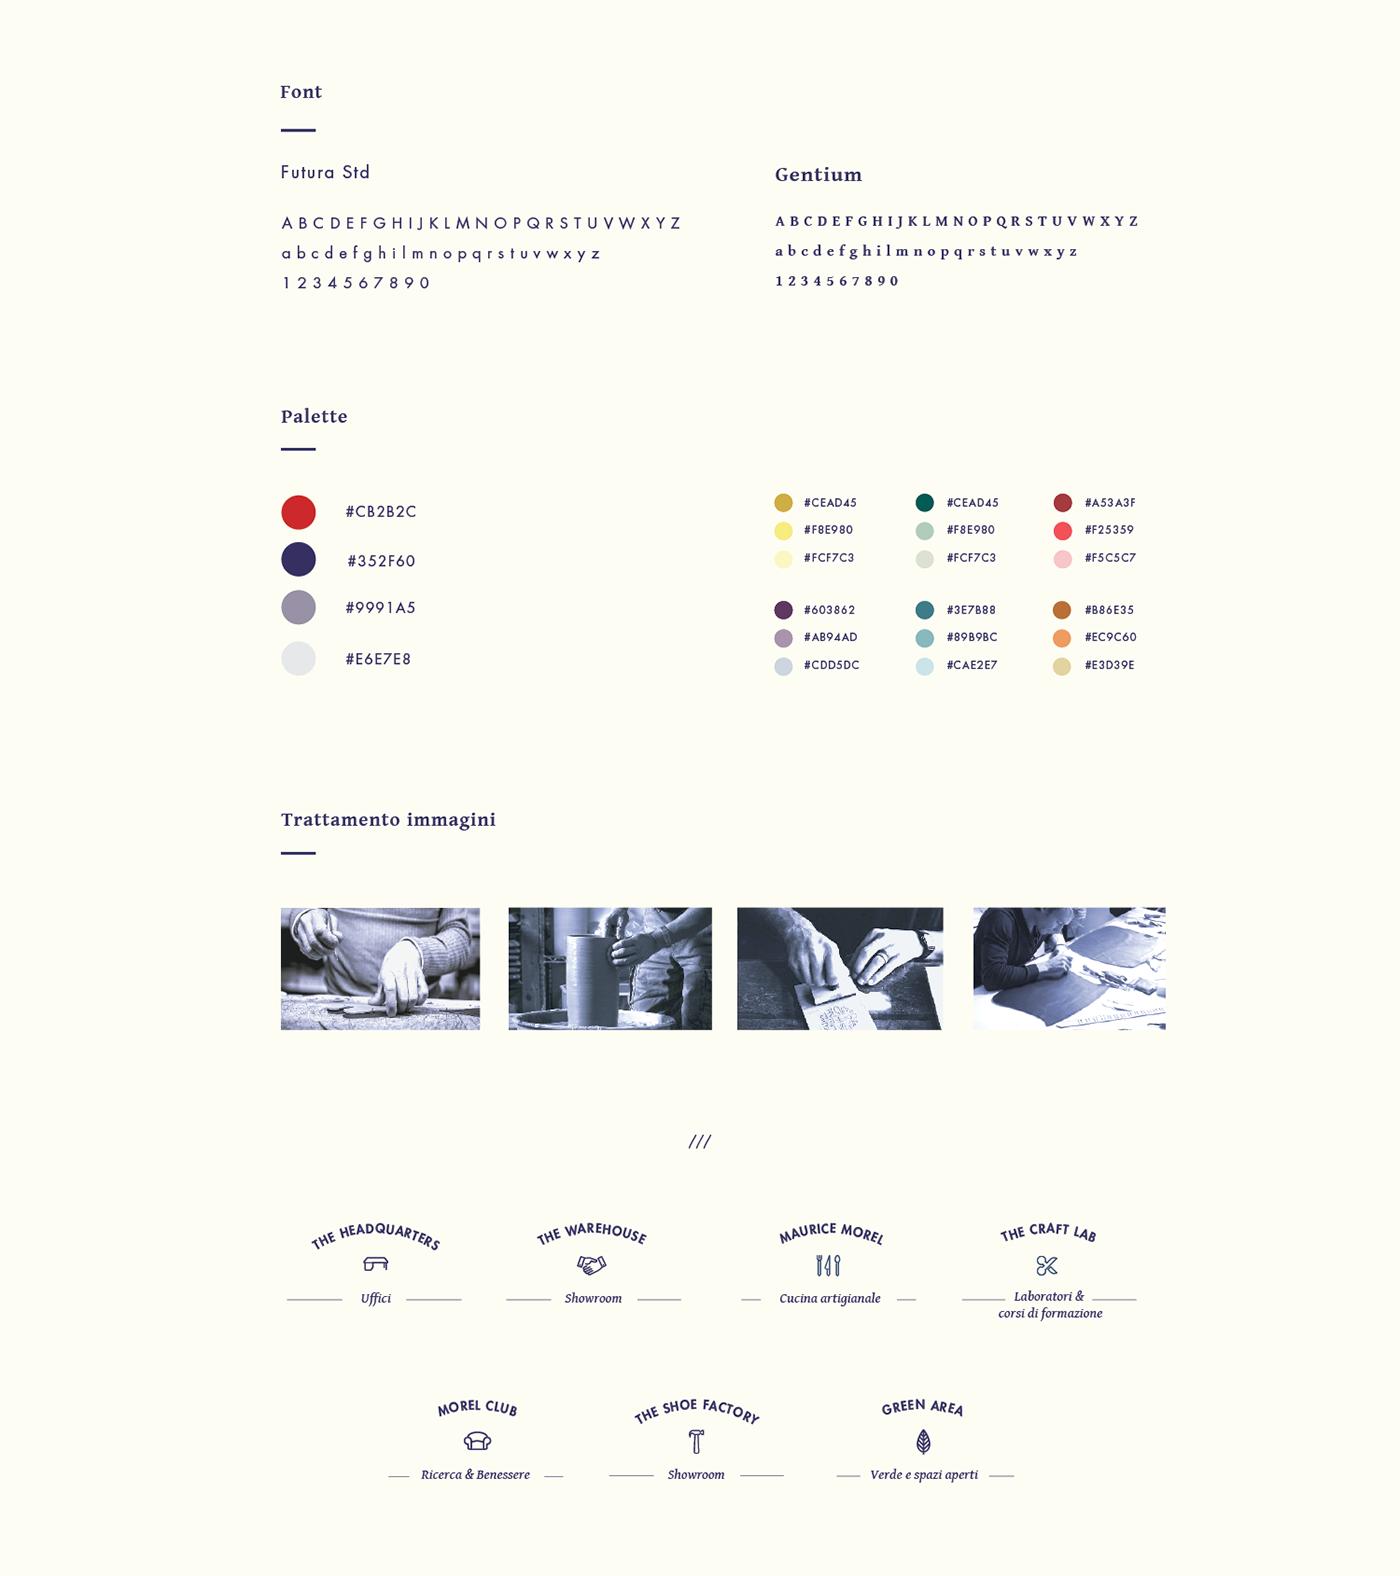 morel morelmilano coworking brand brandidentity collage